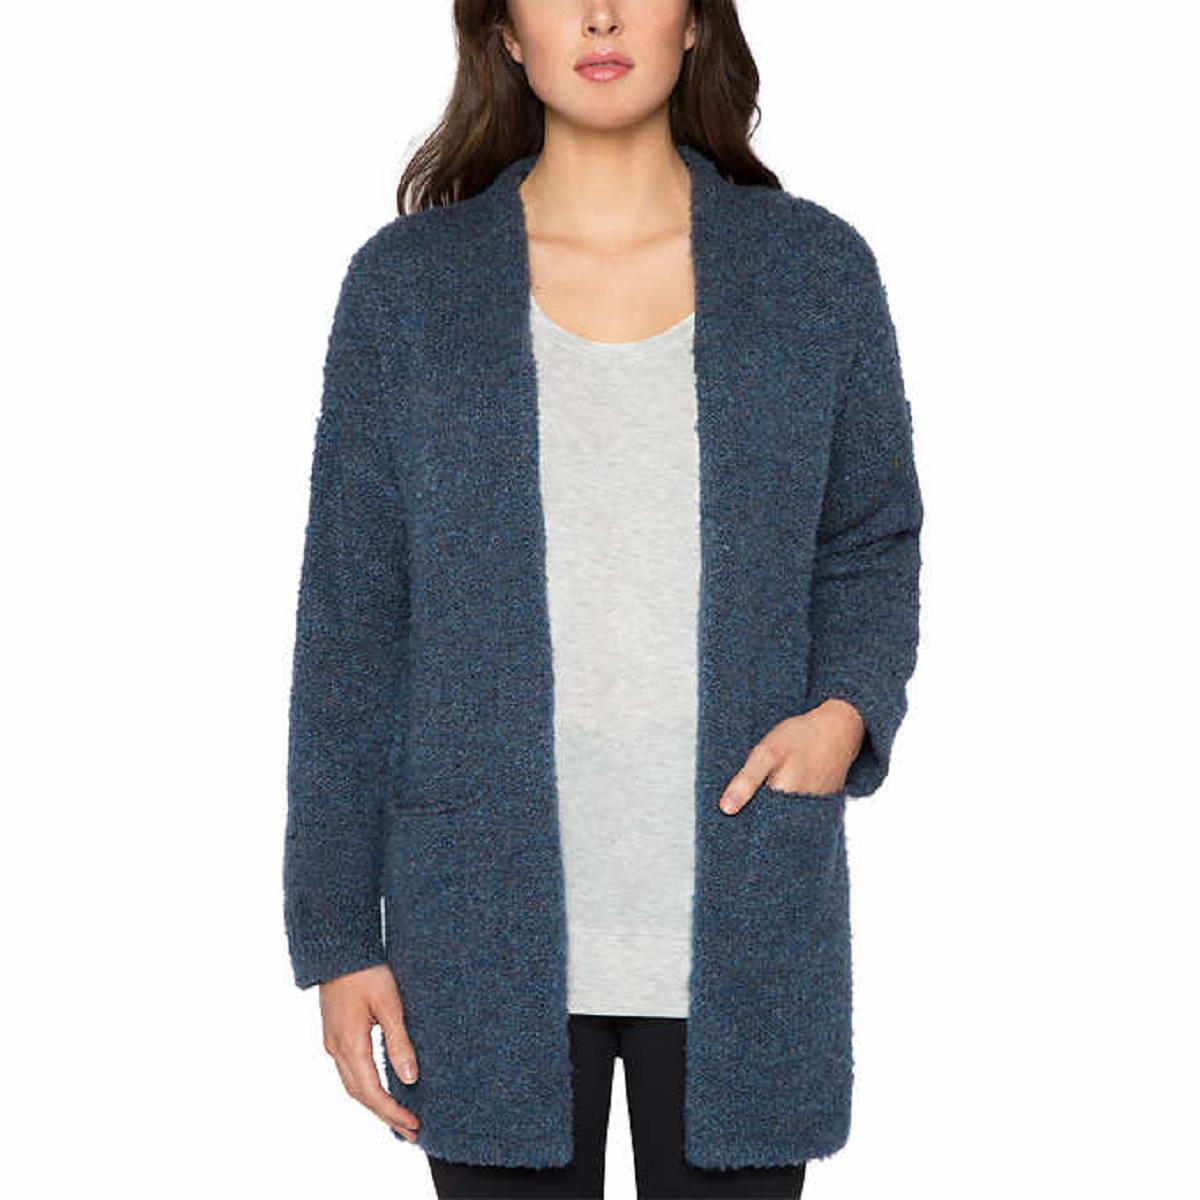 Matty M Women's Oversized Open Front Cardigan Sweater | eBay